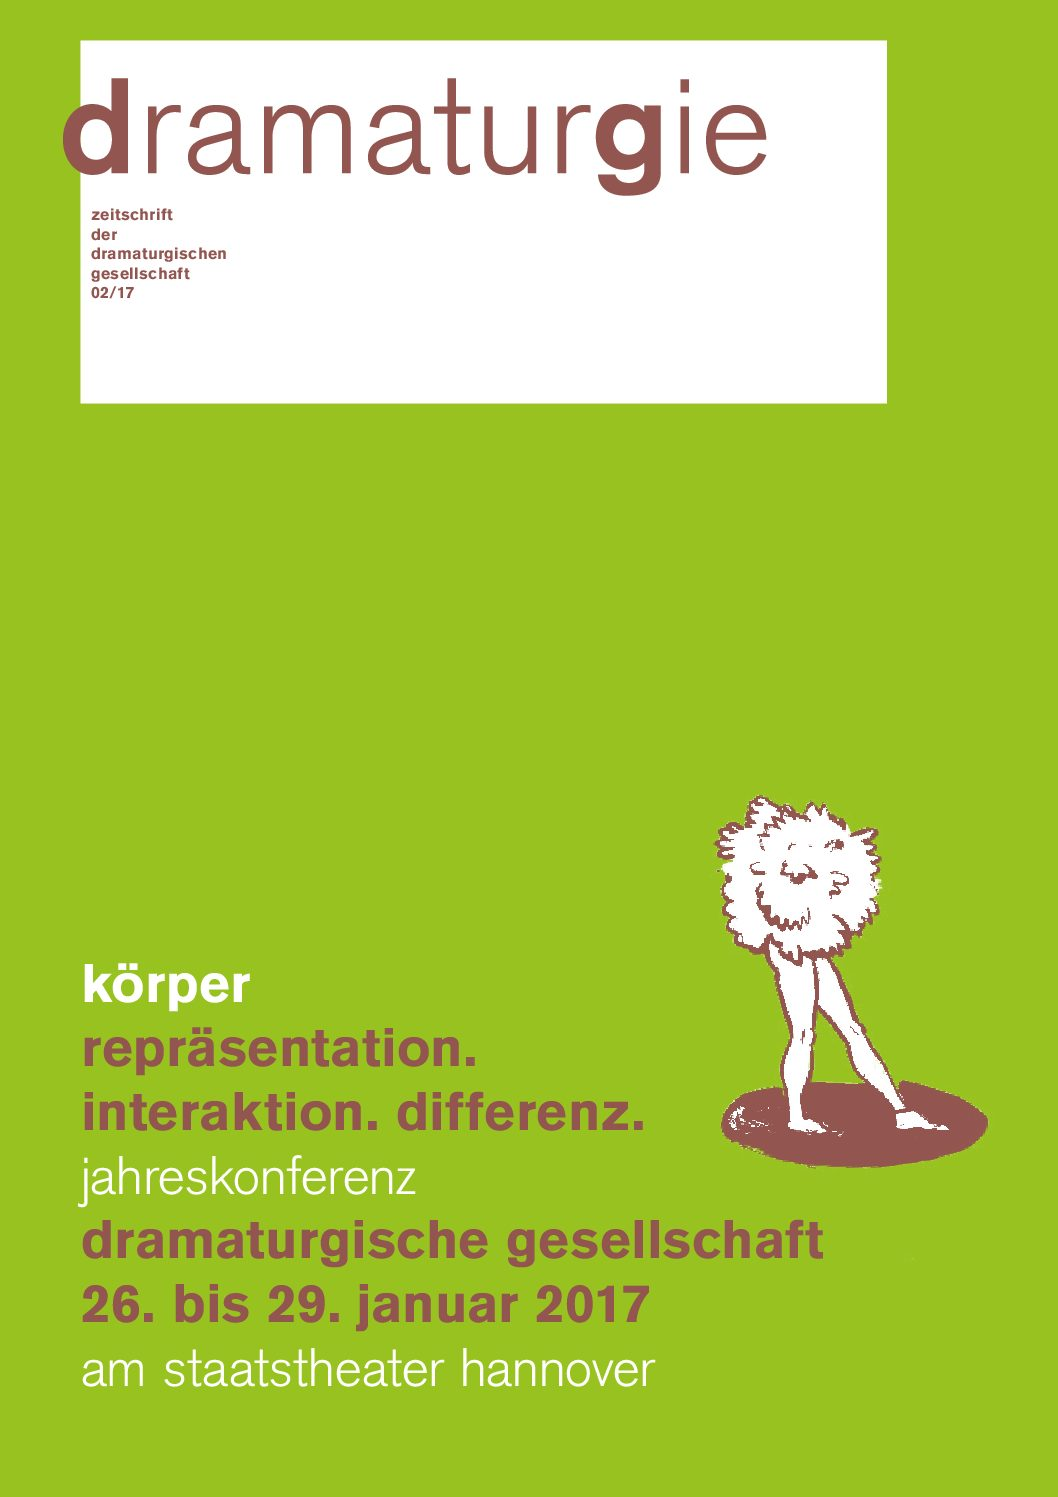 Thumbnail zum PDF: Dramaturgie 2017/2<br /> Körper. Repräsentation. Interaktion. Differenz<br />